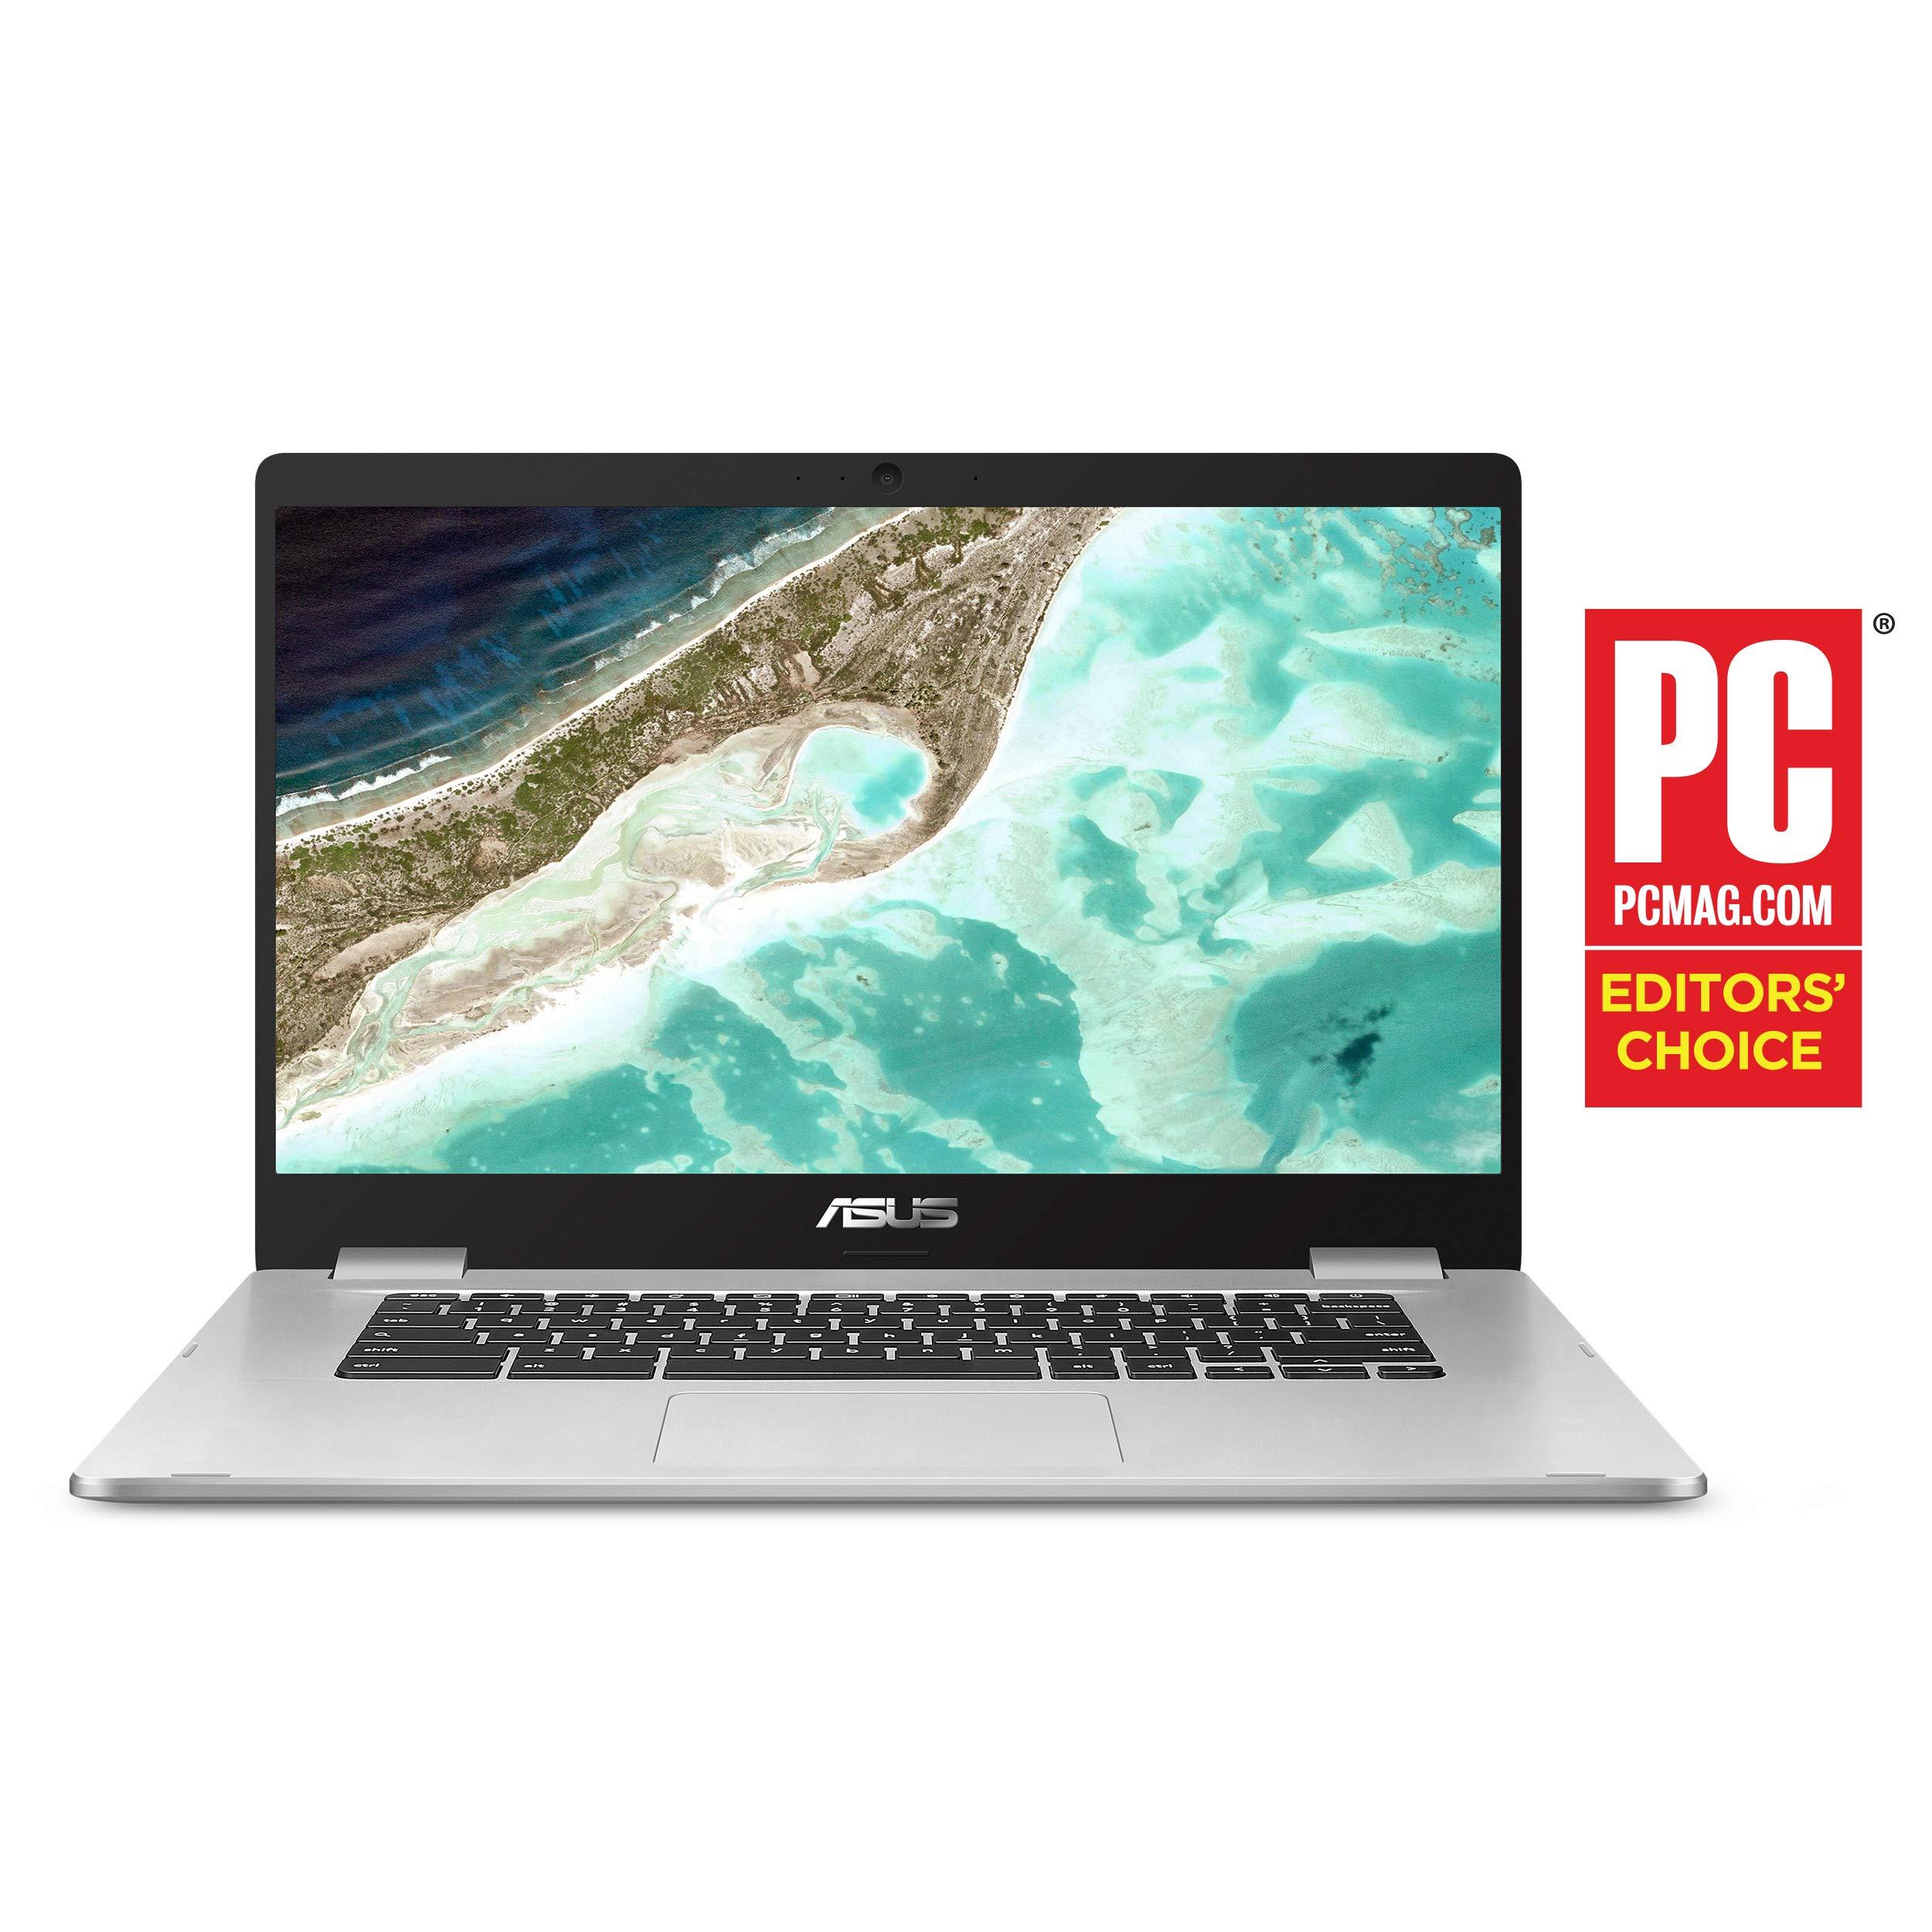 Asus Chromebook C523NA-DH02 15.6'' HD NanoEdge Display, 180 Degree, Intel Dual Core Celeron Processor, 4GB RAM, 32GB eMMC Storage, Silver Color by ASUS